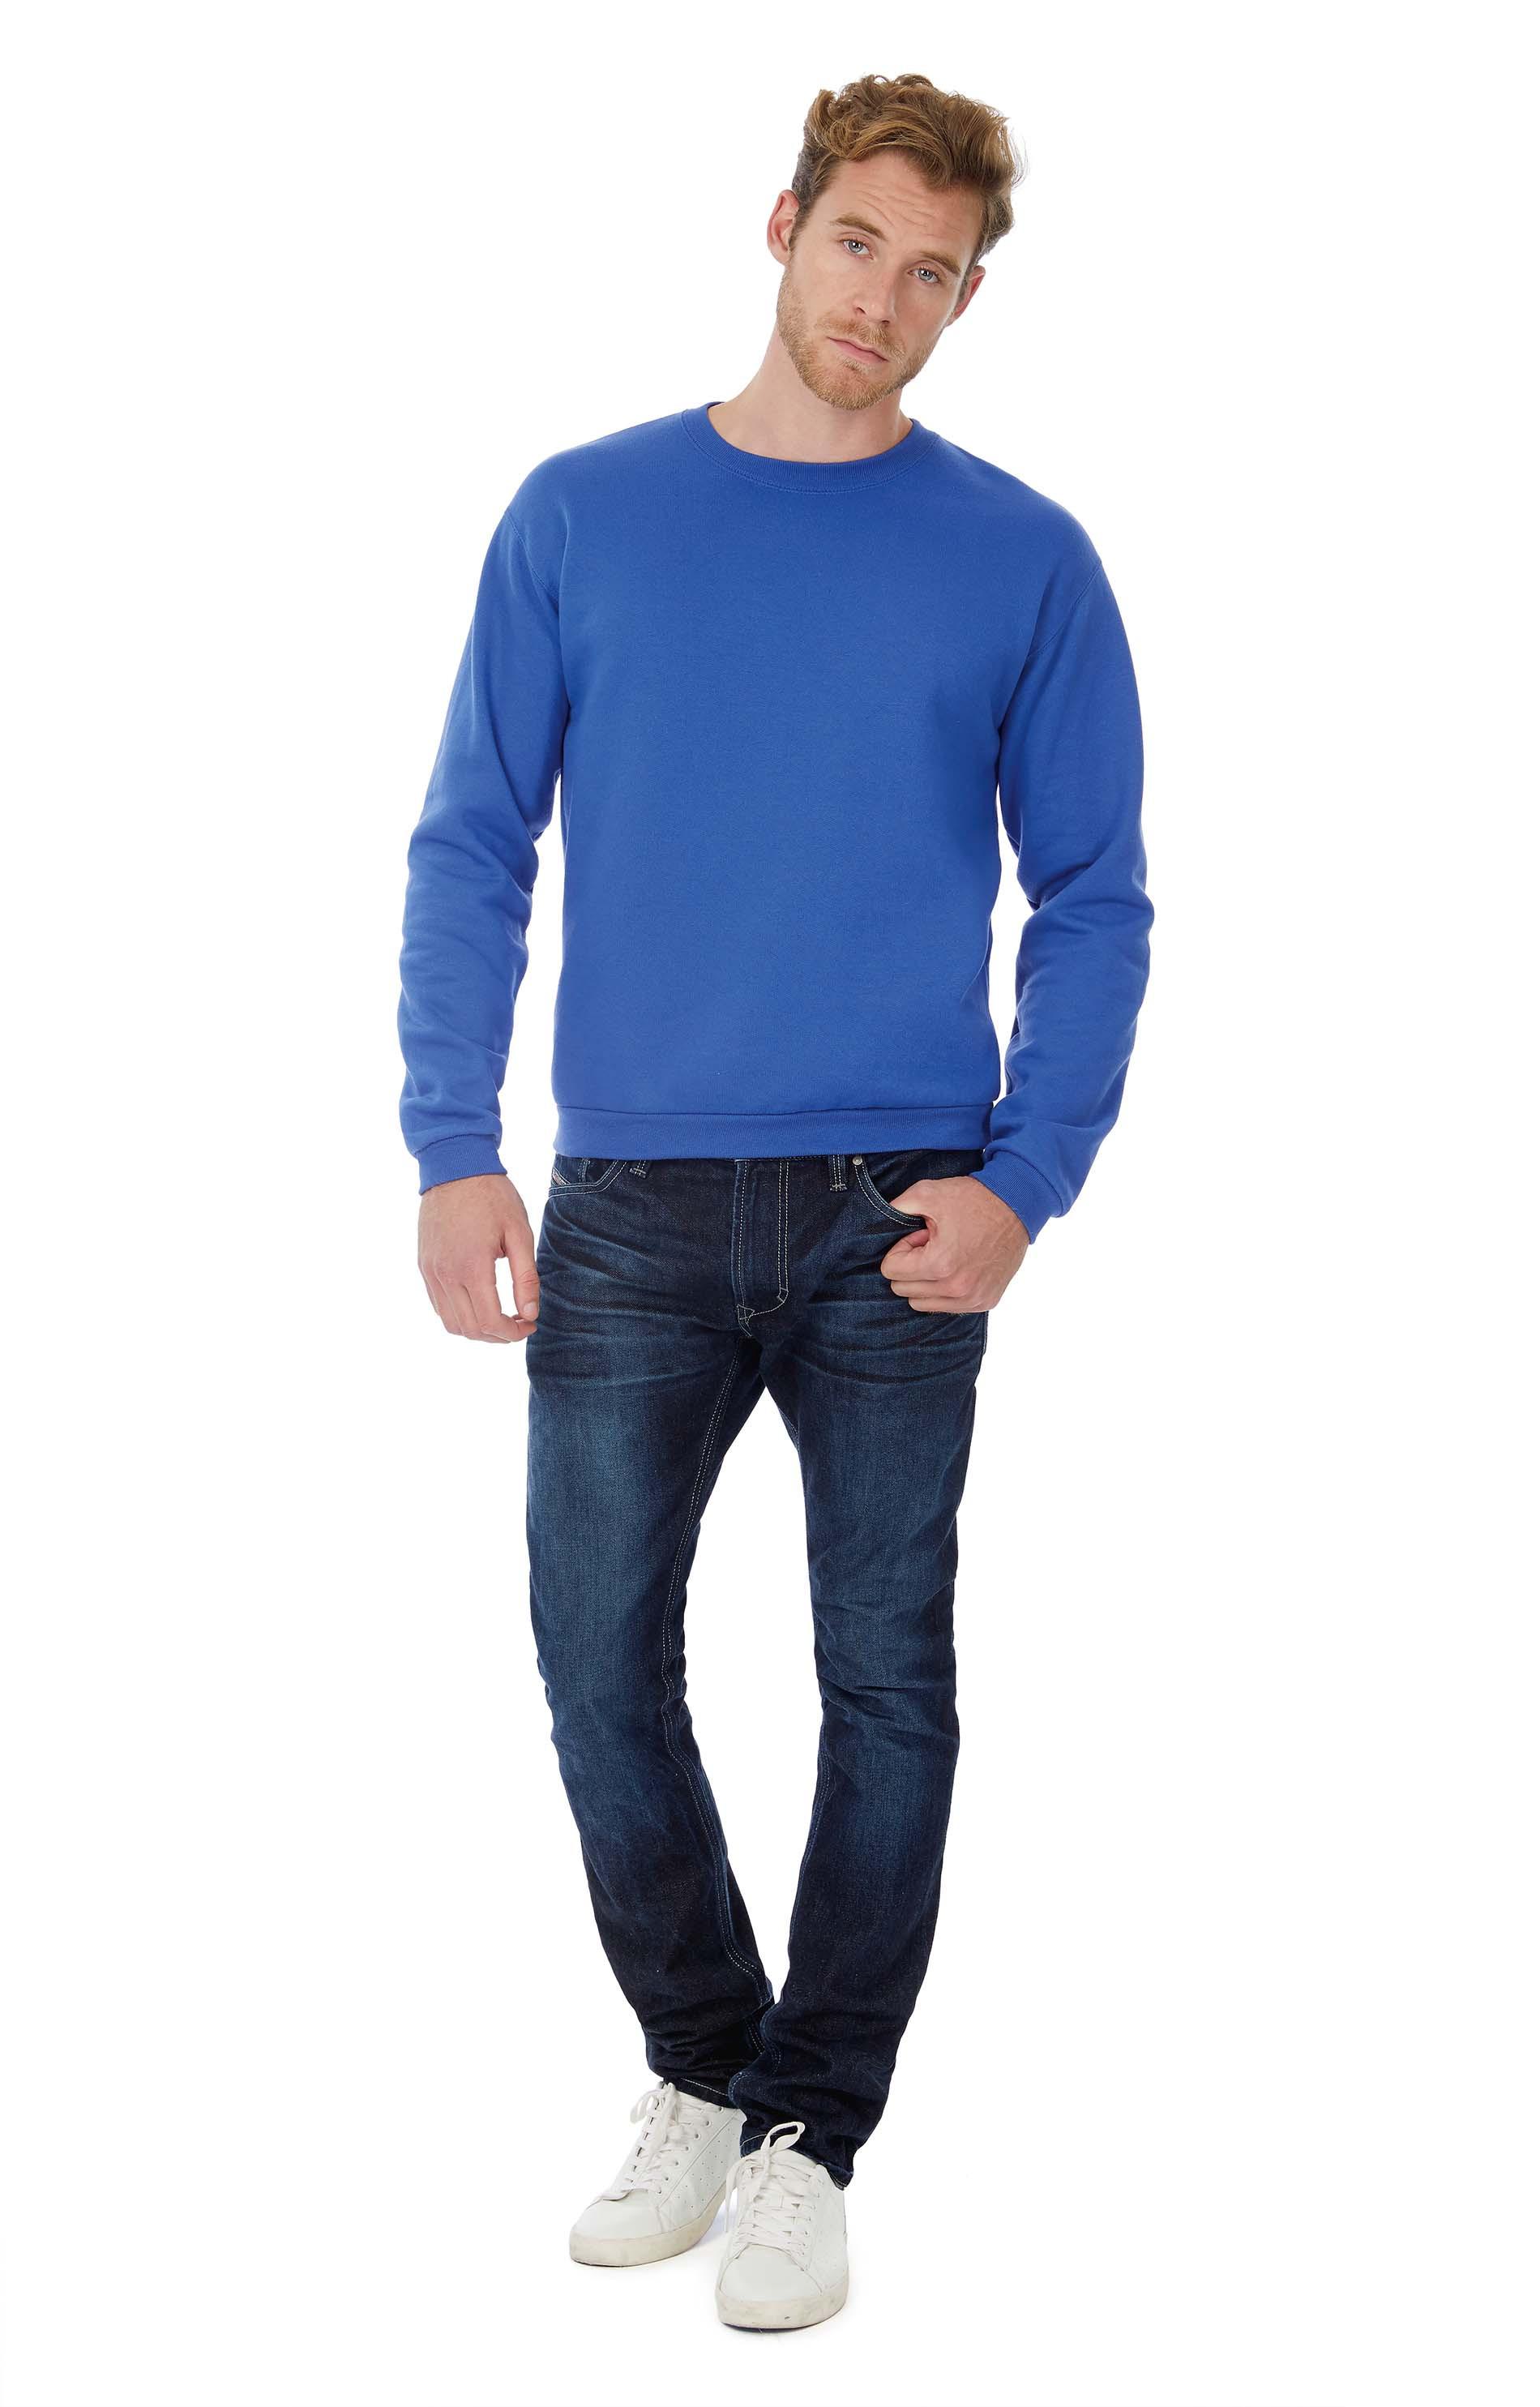 B&C Sweatshirt col rond ID.202